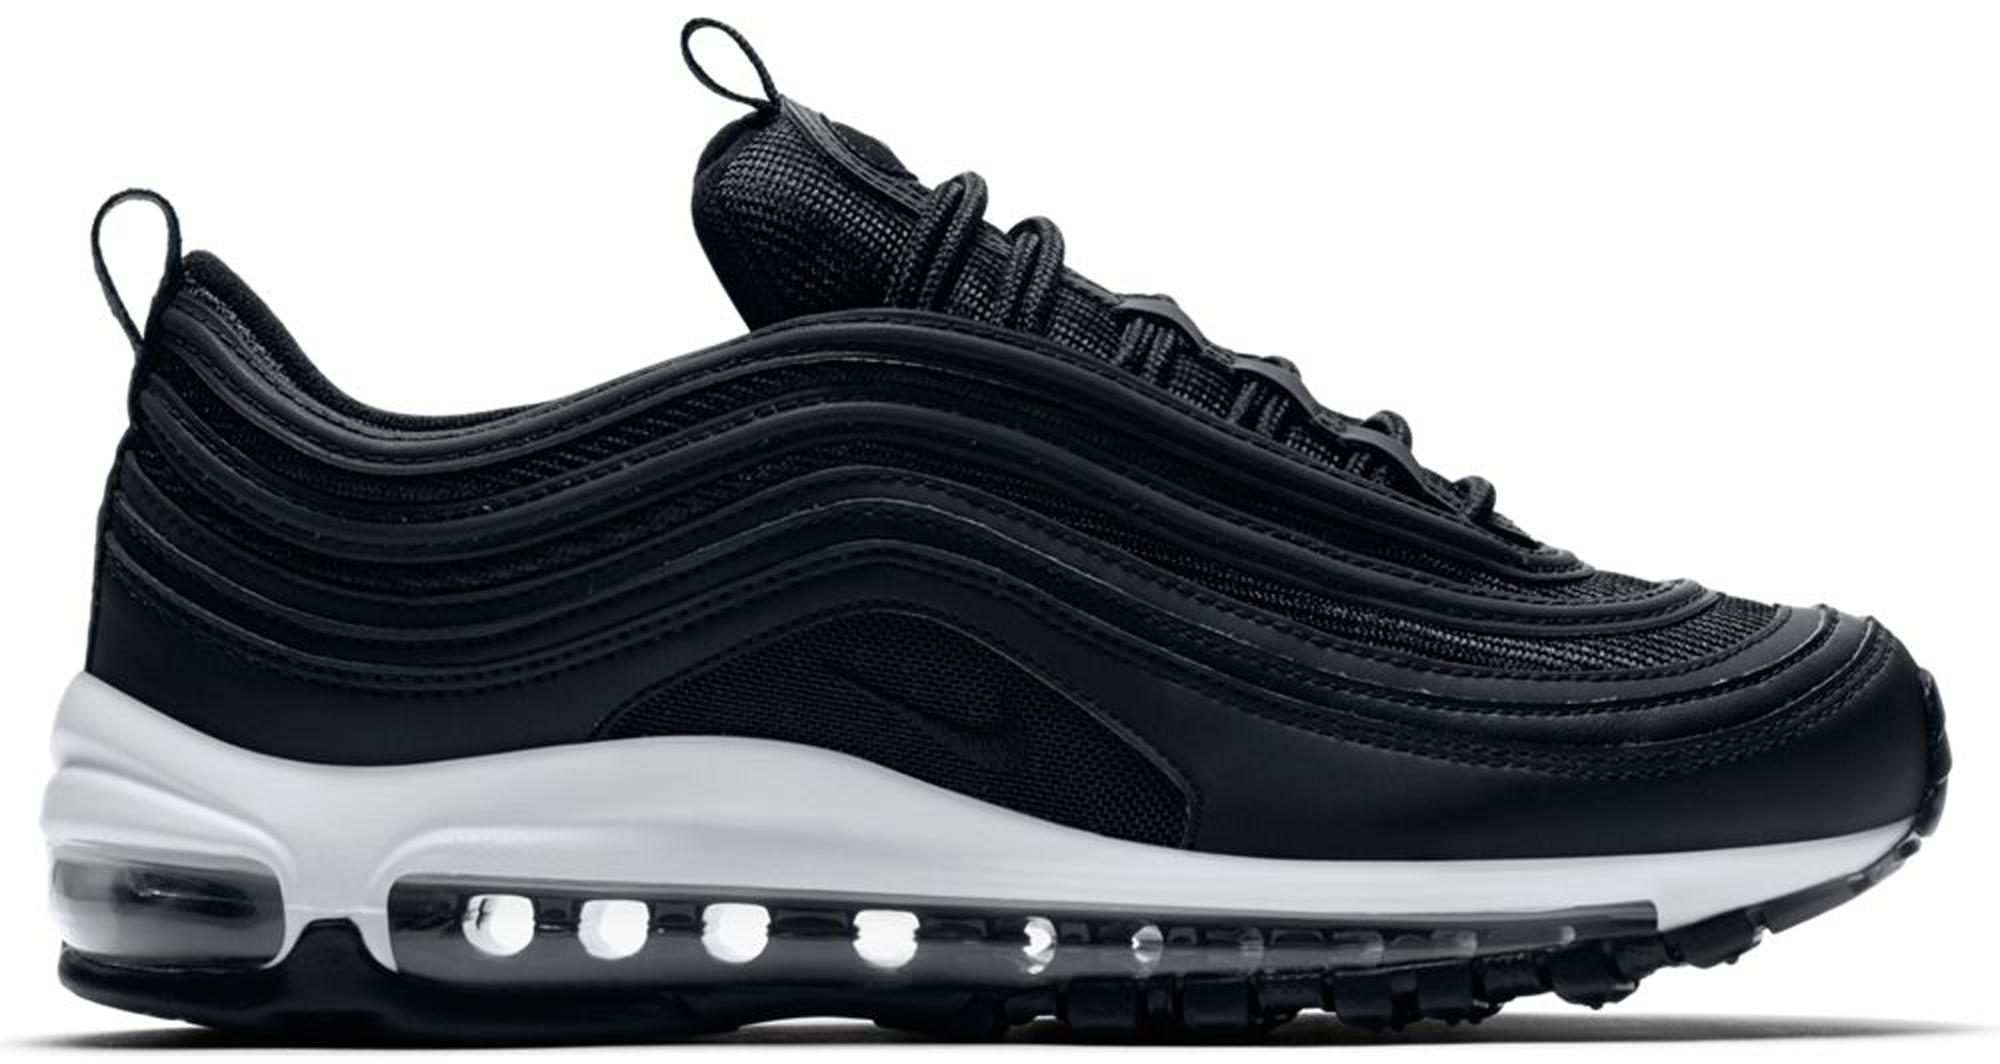 Nike Air Max 97 Black Black White (W